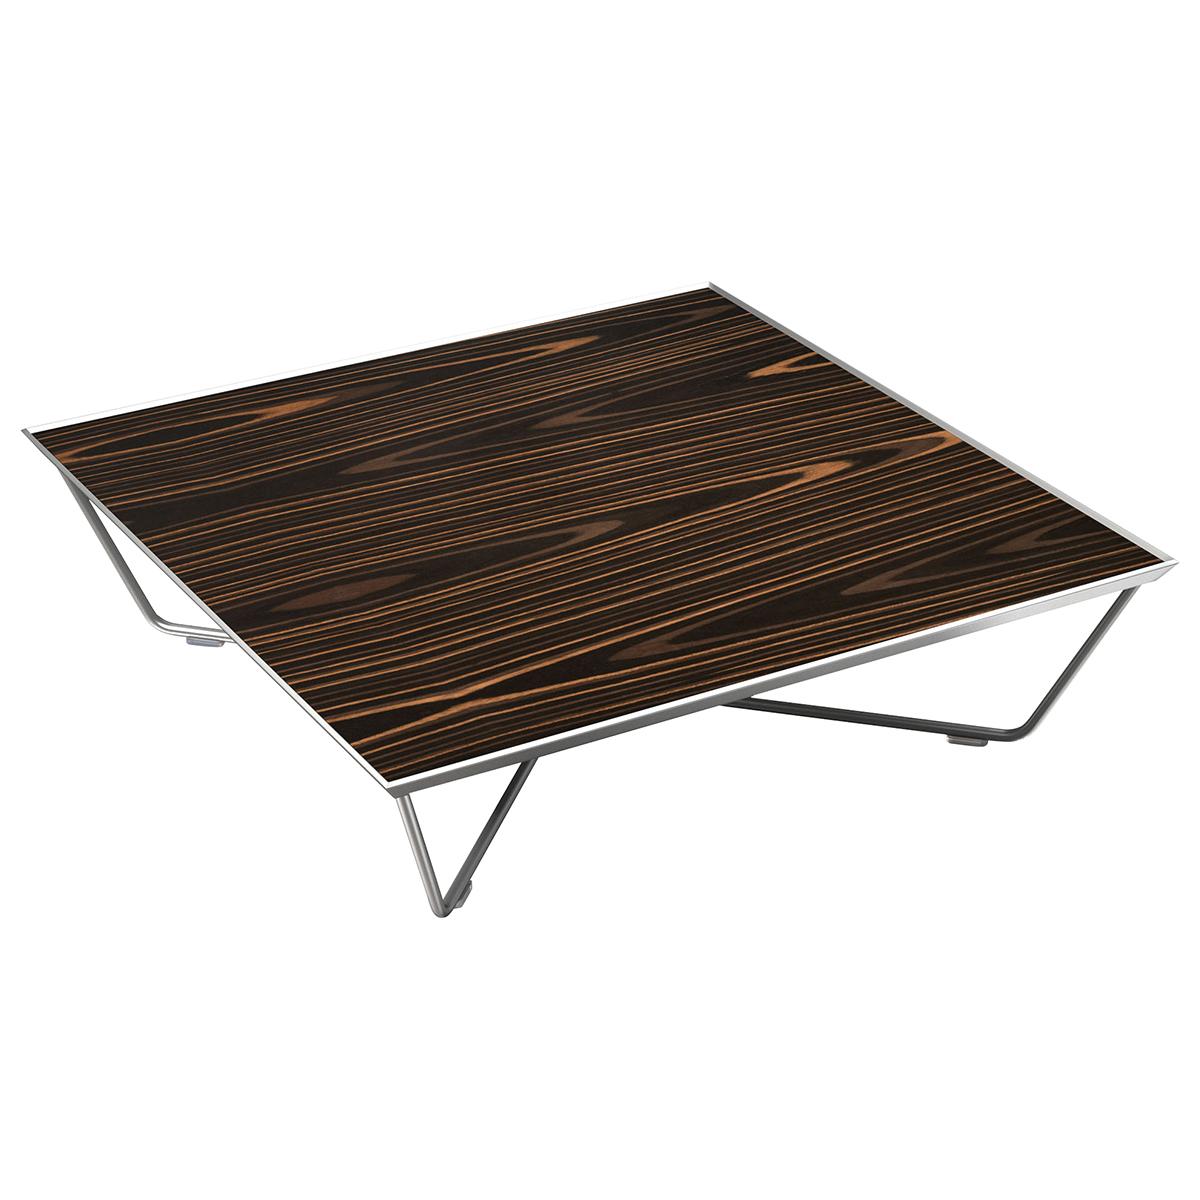 Amazon Com Black Steel Square Coffee Table: Cale Square Coffee Table